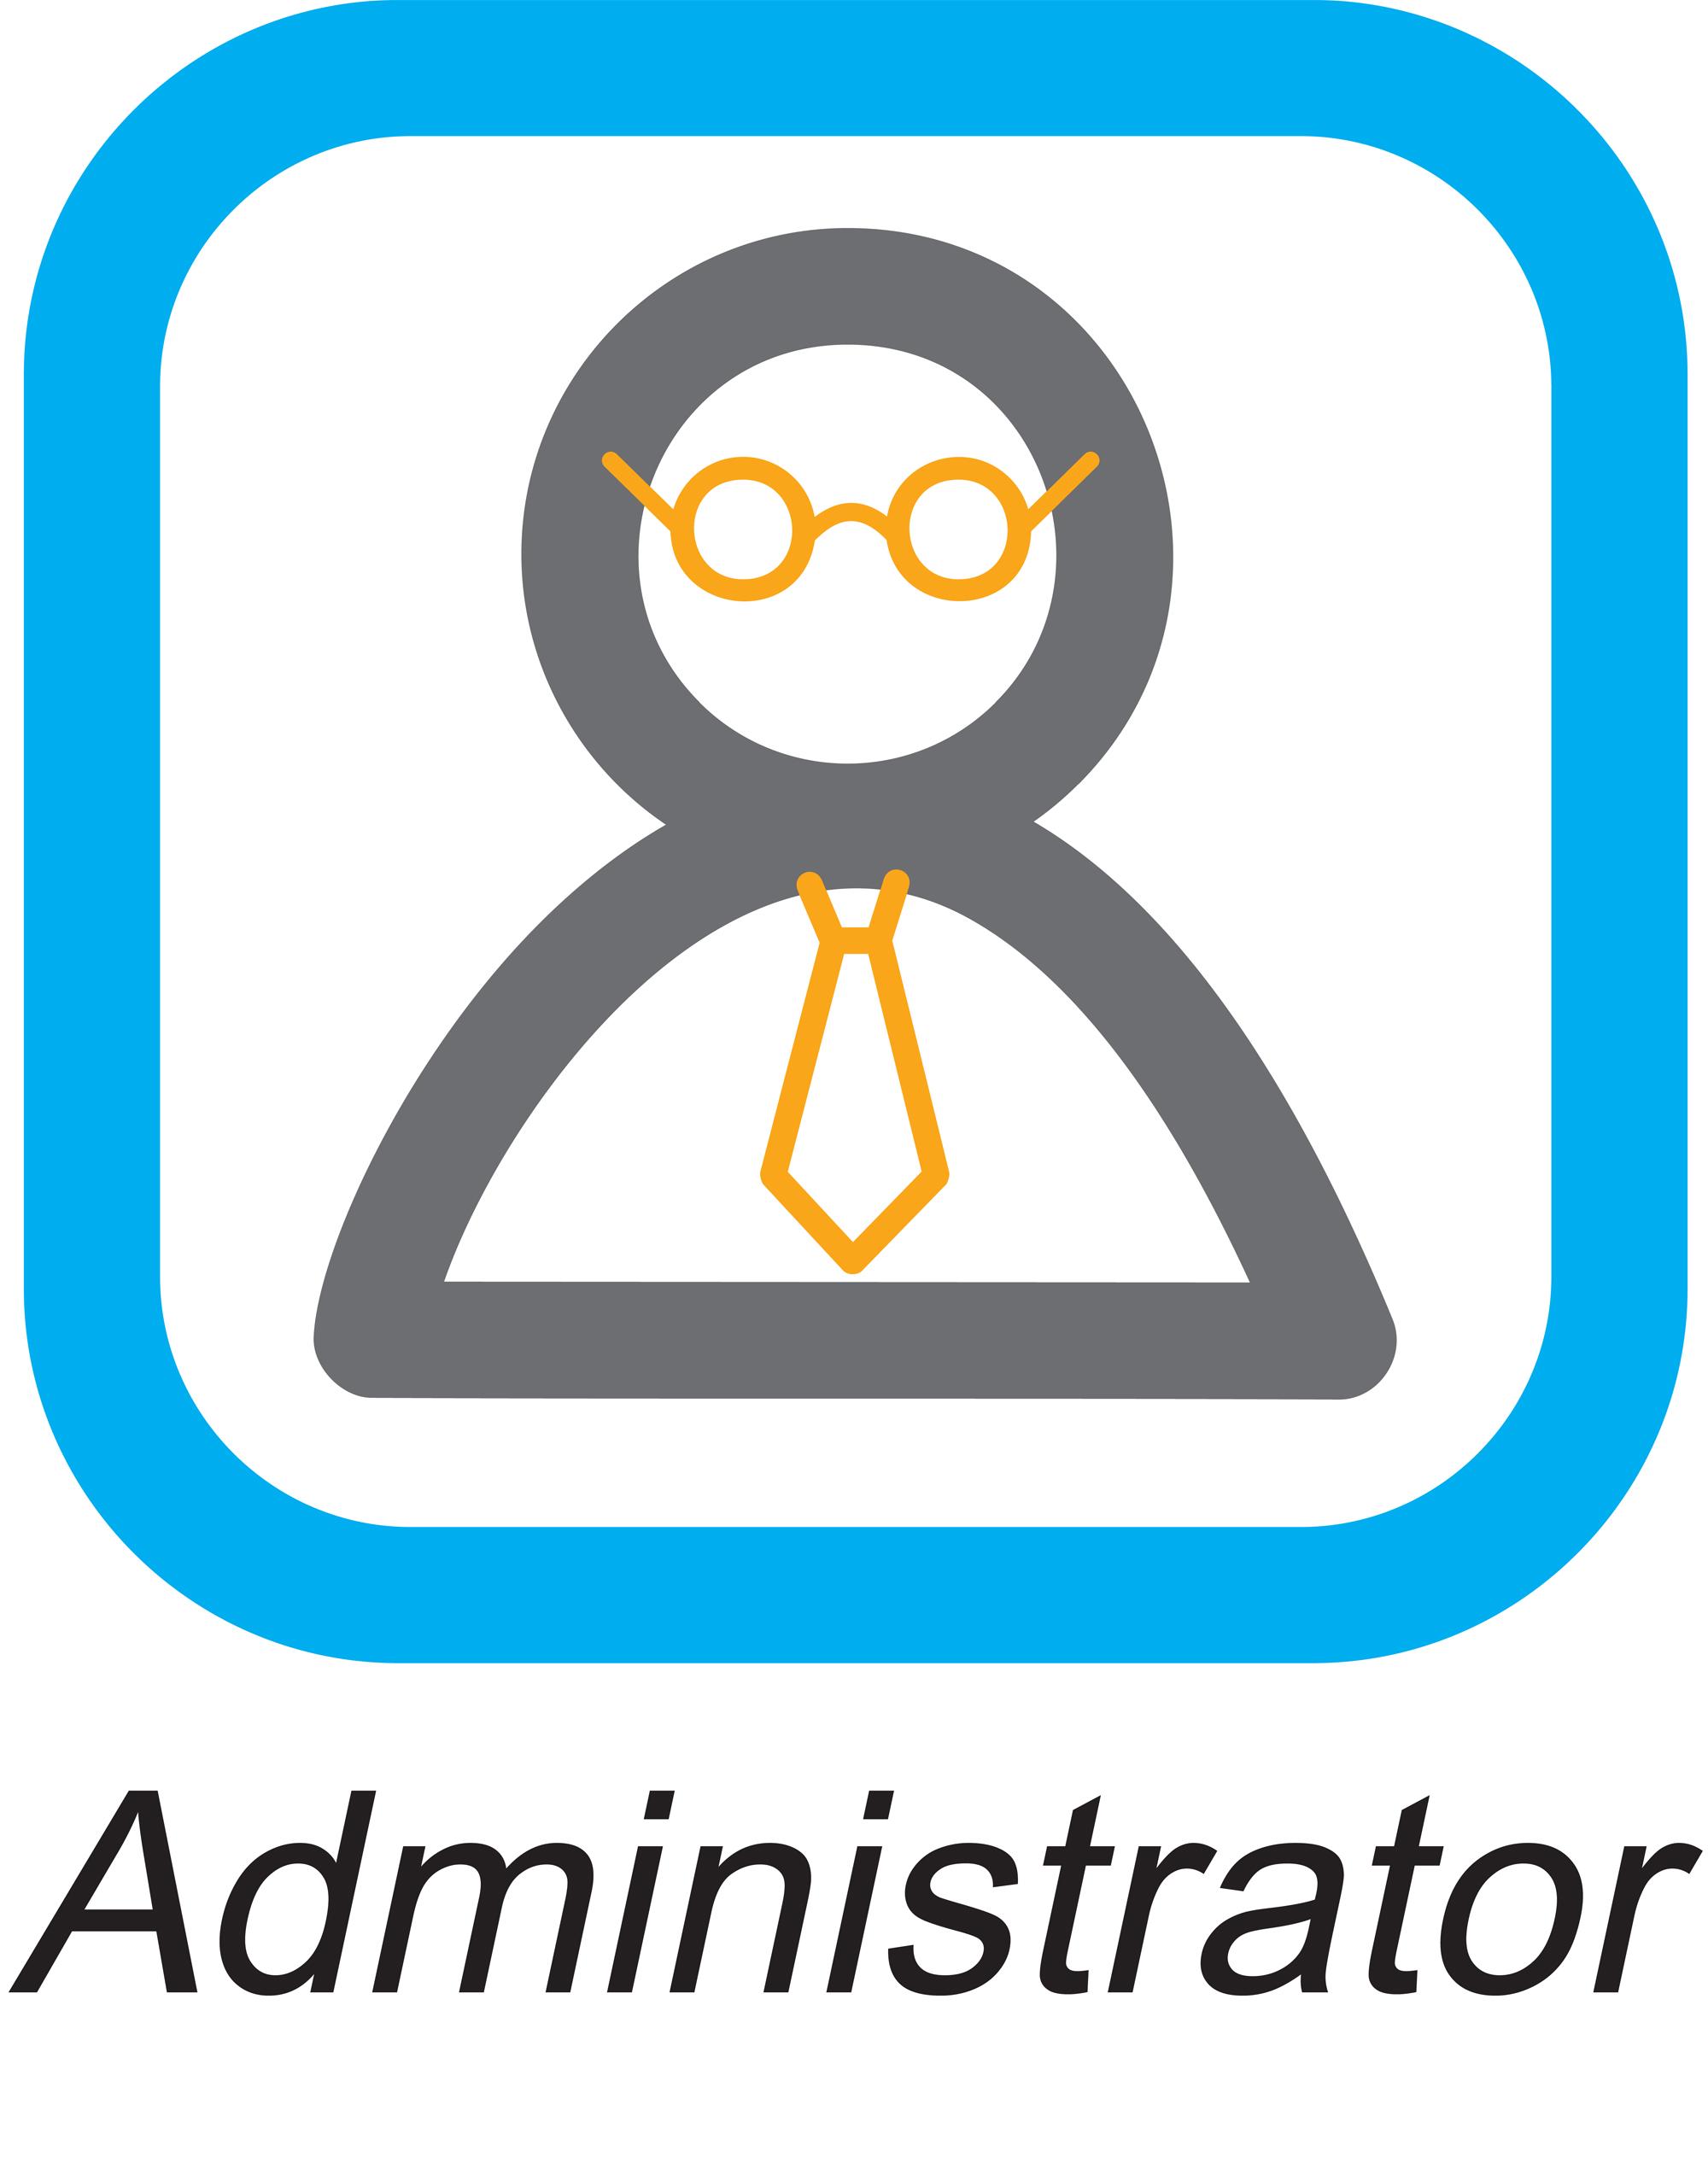 Administrator - Administrator jpg